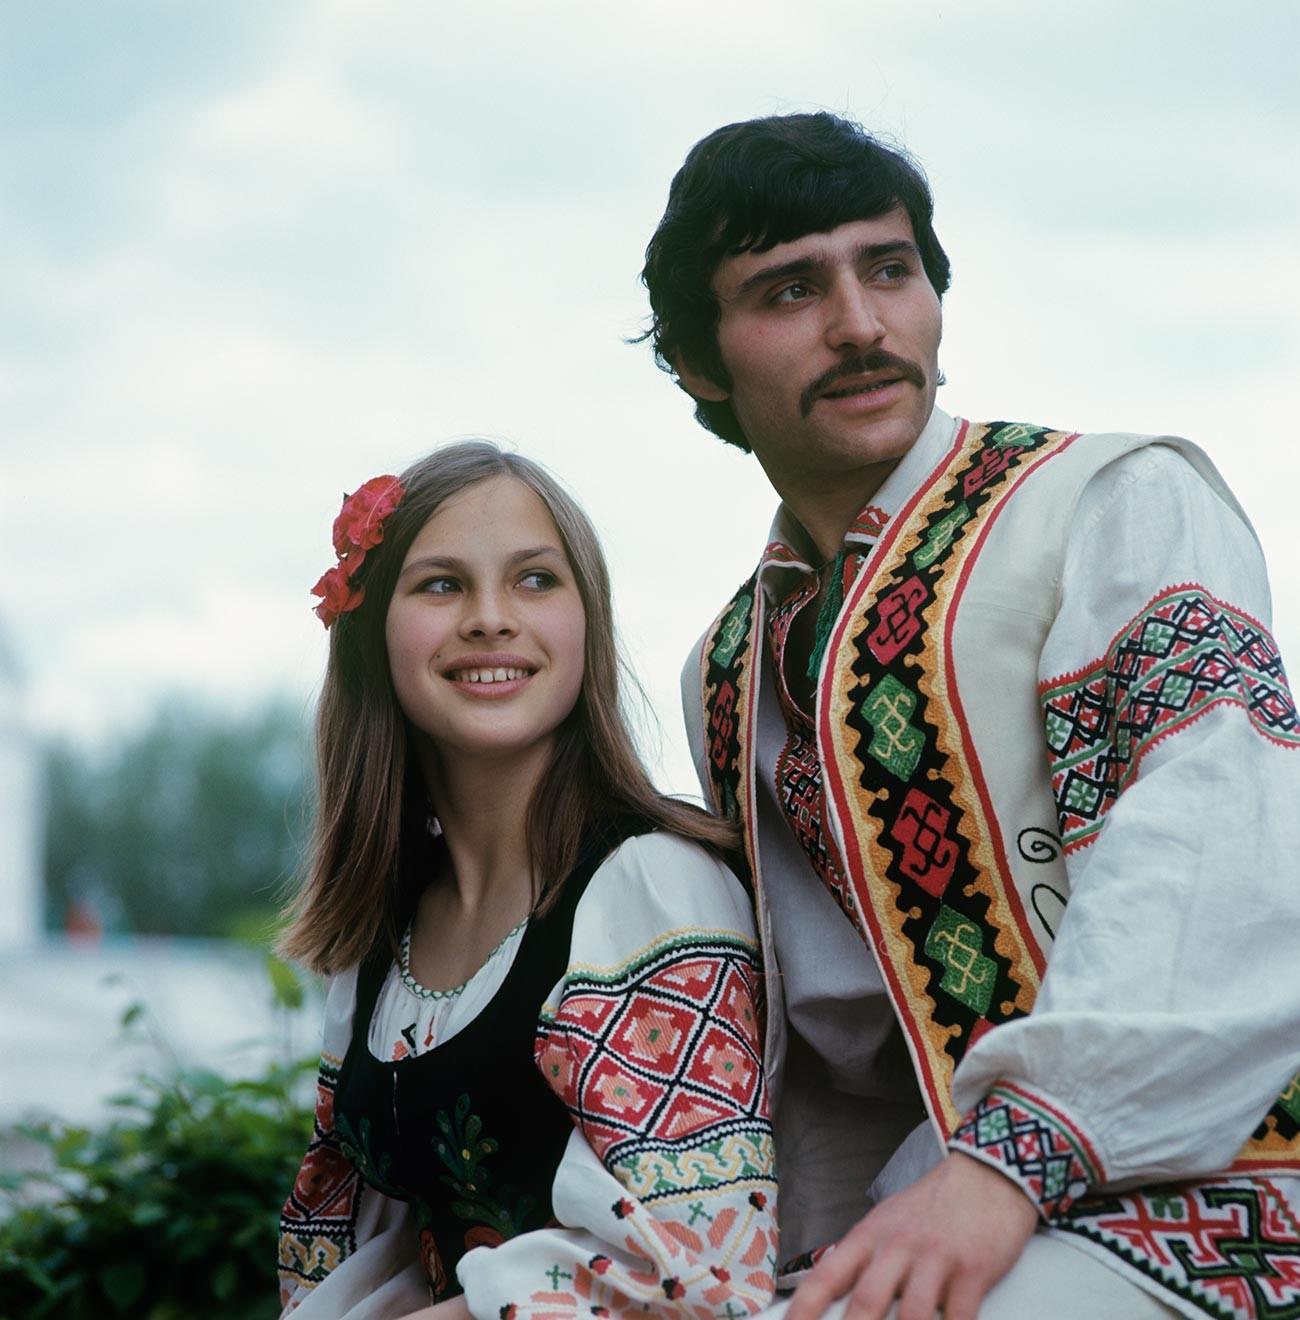 Anggota ansambel tarian rakyat Moldavanesca, 1975.